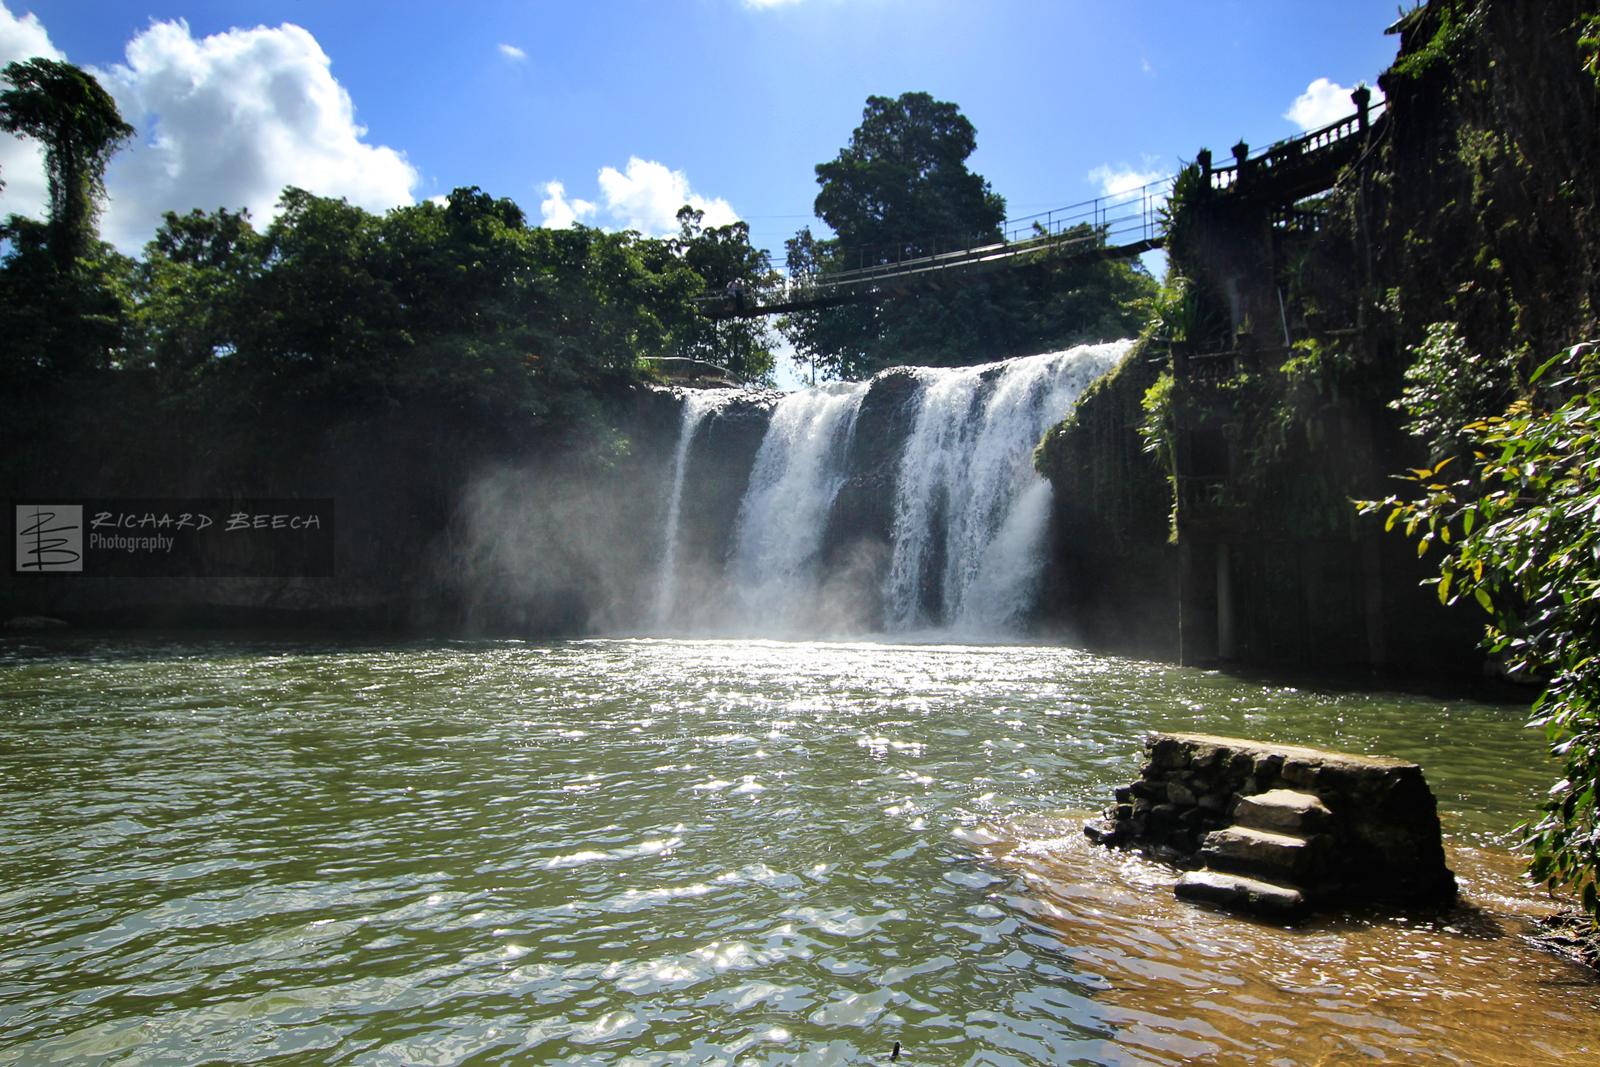 paronellaparkwaterfall1600.jpg